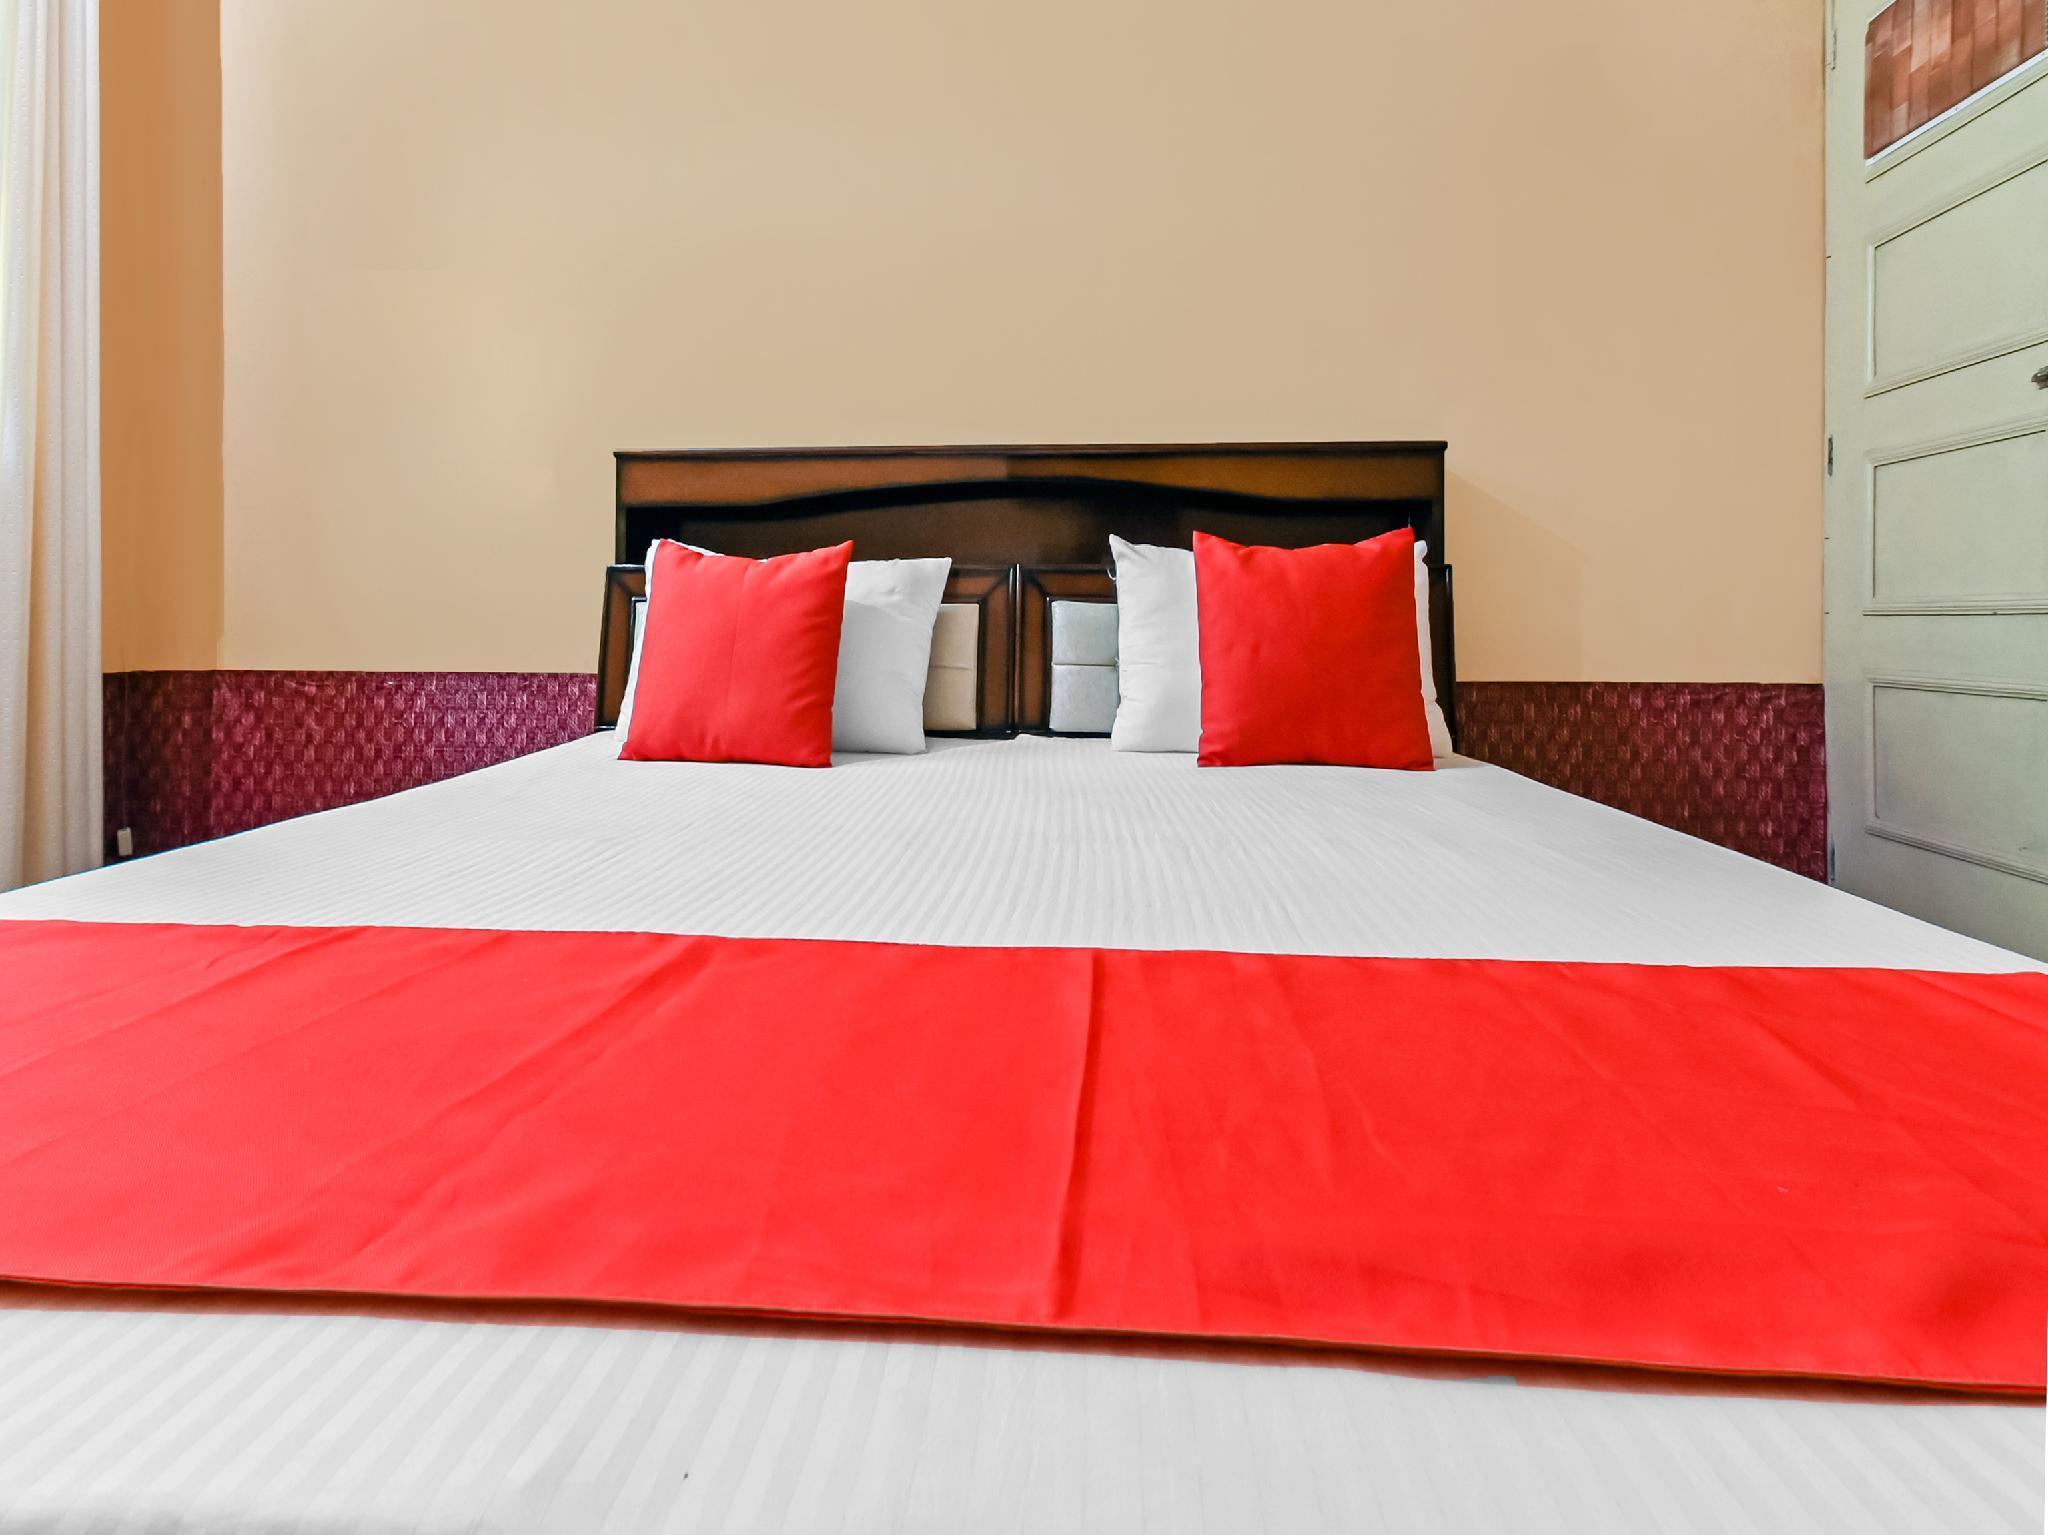 OYO 41144 Hotel V.m., Meerut